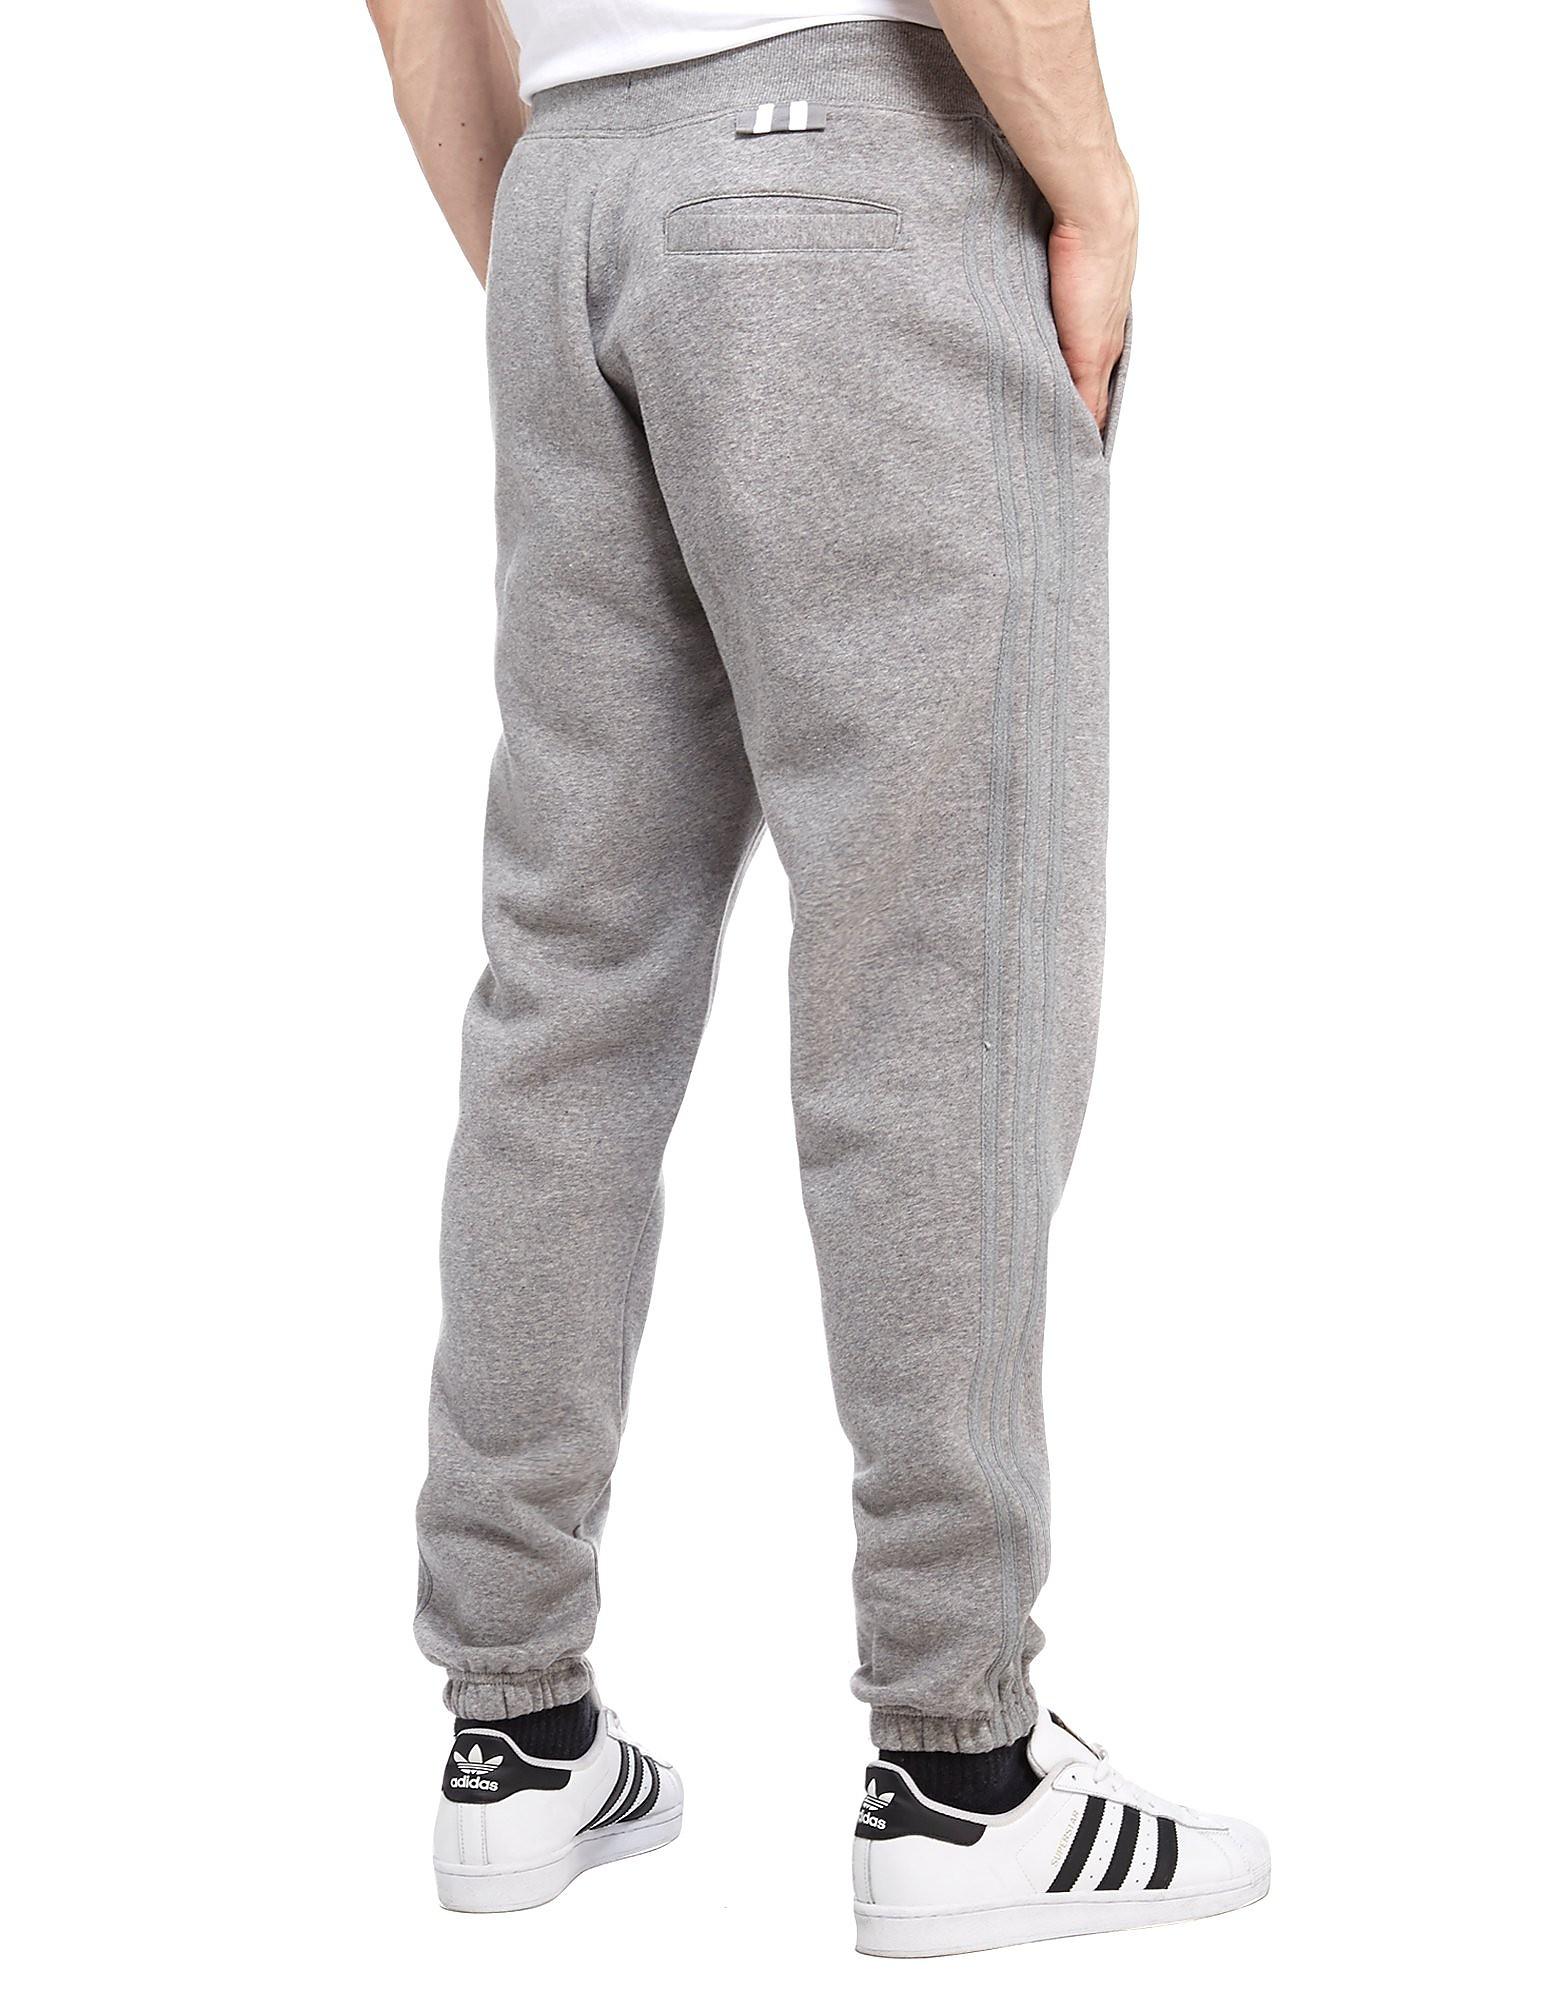 adidas Originals Trefoil Fleece Pants